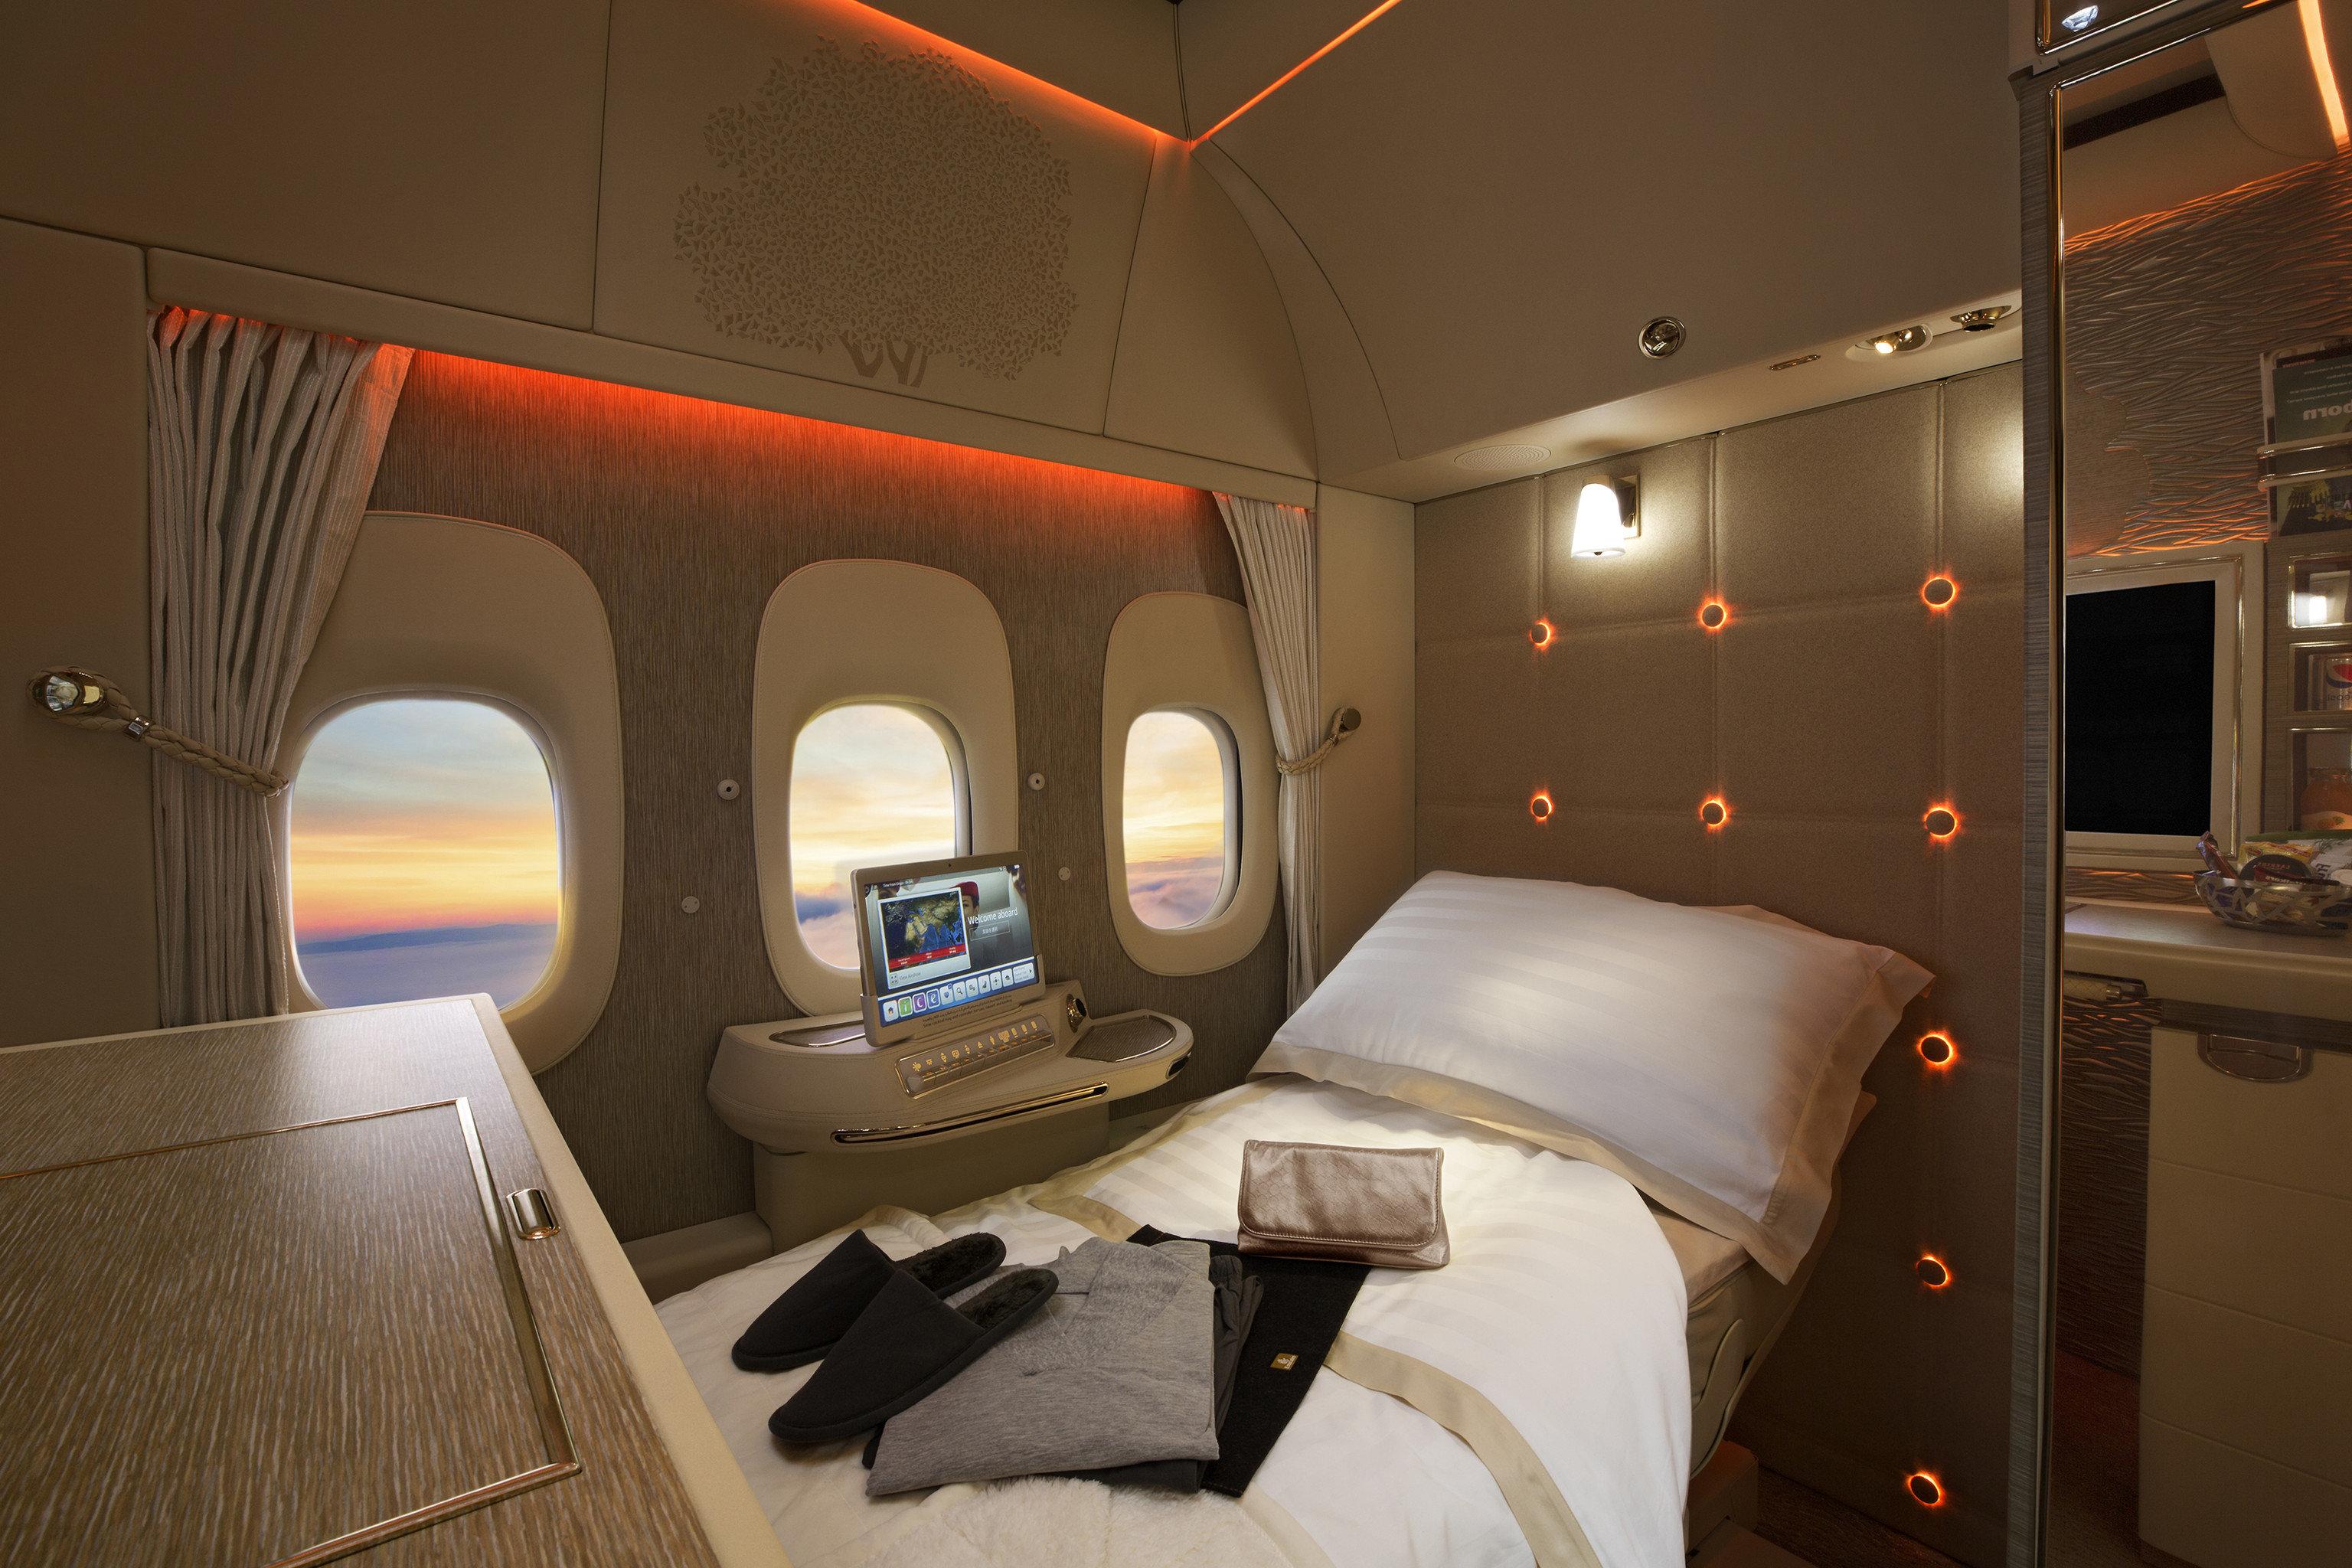 Luxury Travel News indoor room interior design bed ceiling Suite hotel